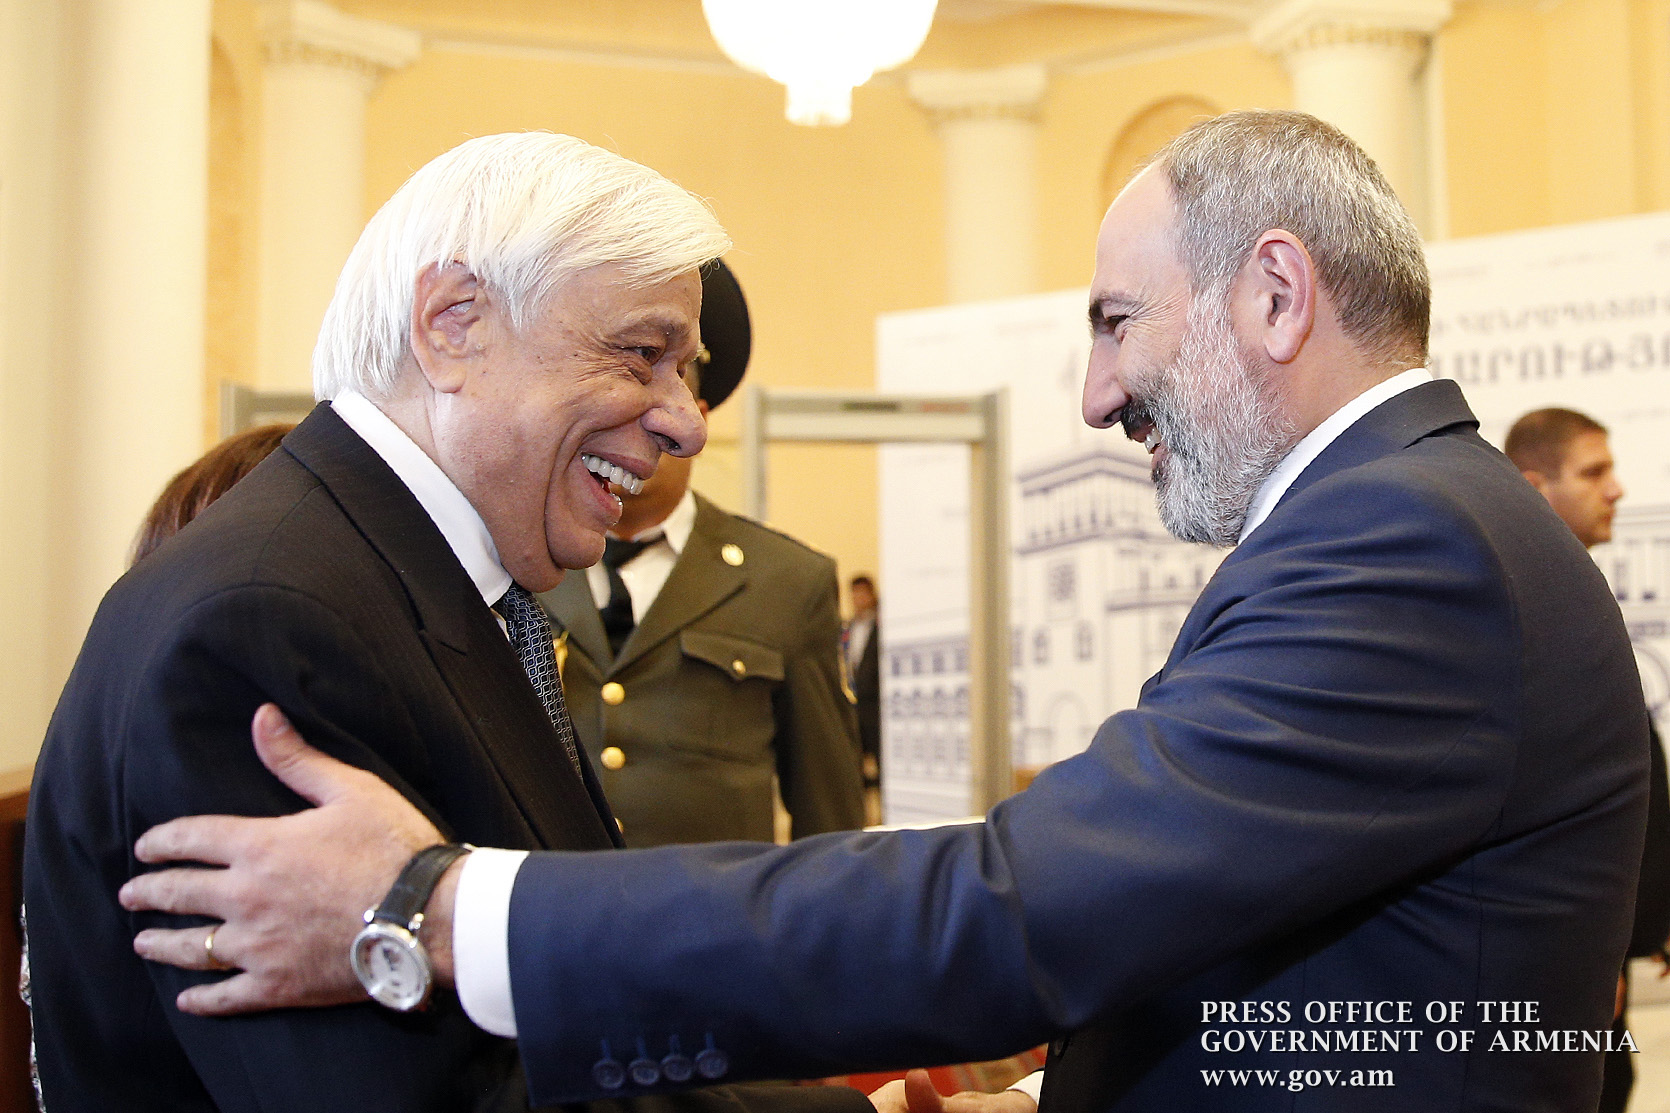 https://www.primeminister.am/files/pics/2019/11/05/17476_b.jpg